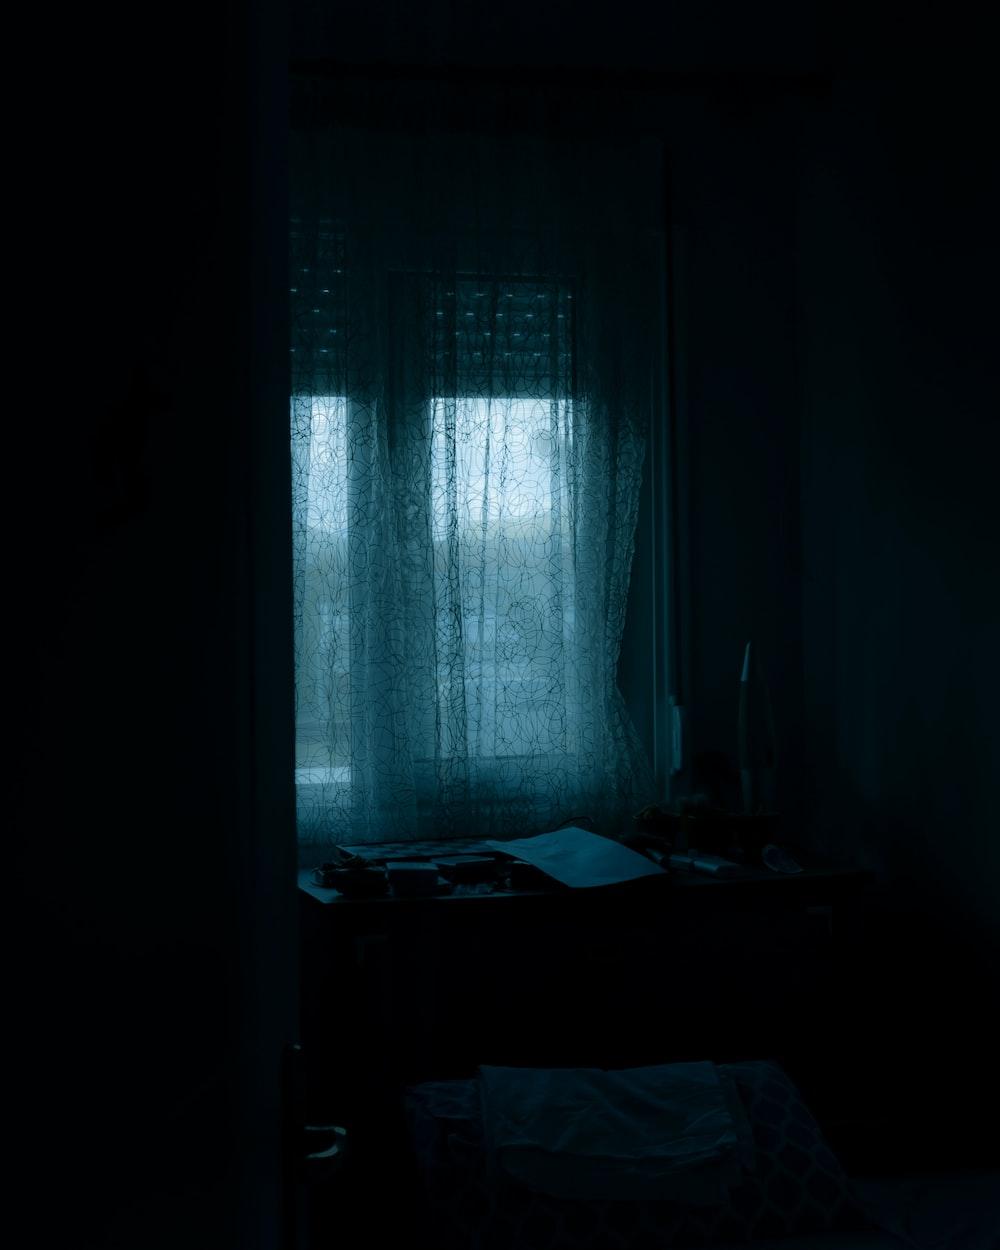 white window curtain on window